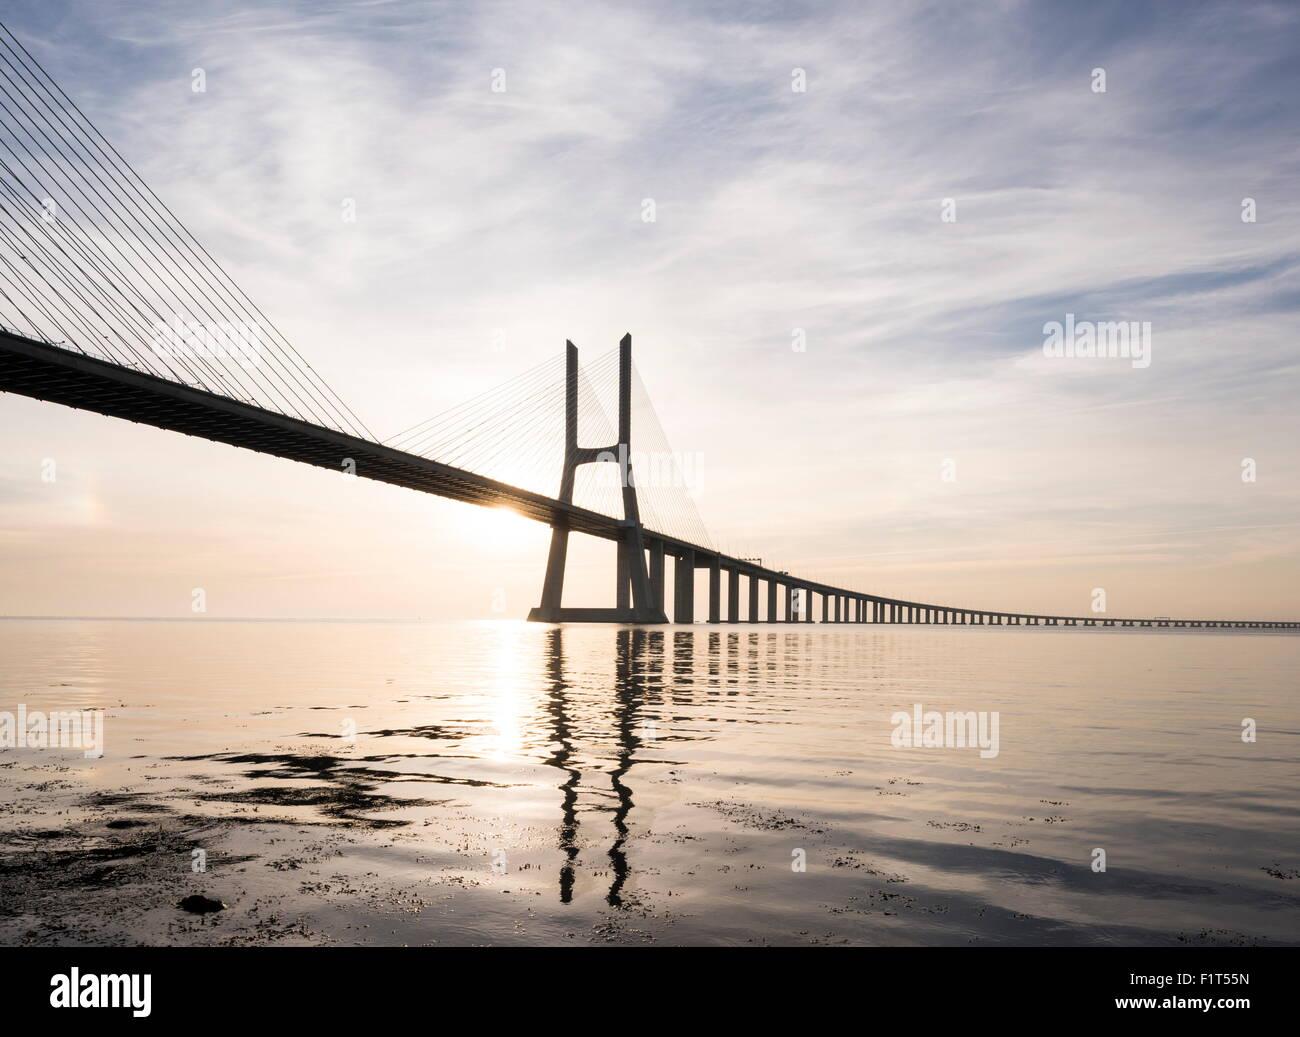 Vasco da Gama Bridge over Rio Tejo (Tagus River) at dawn, Lisbon, Portugal, Europe Stock Photo